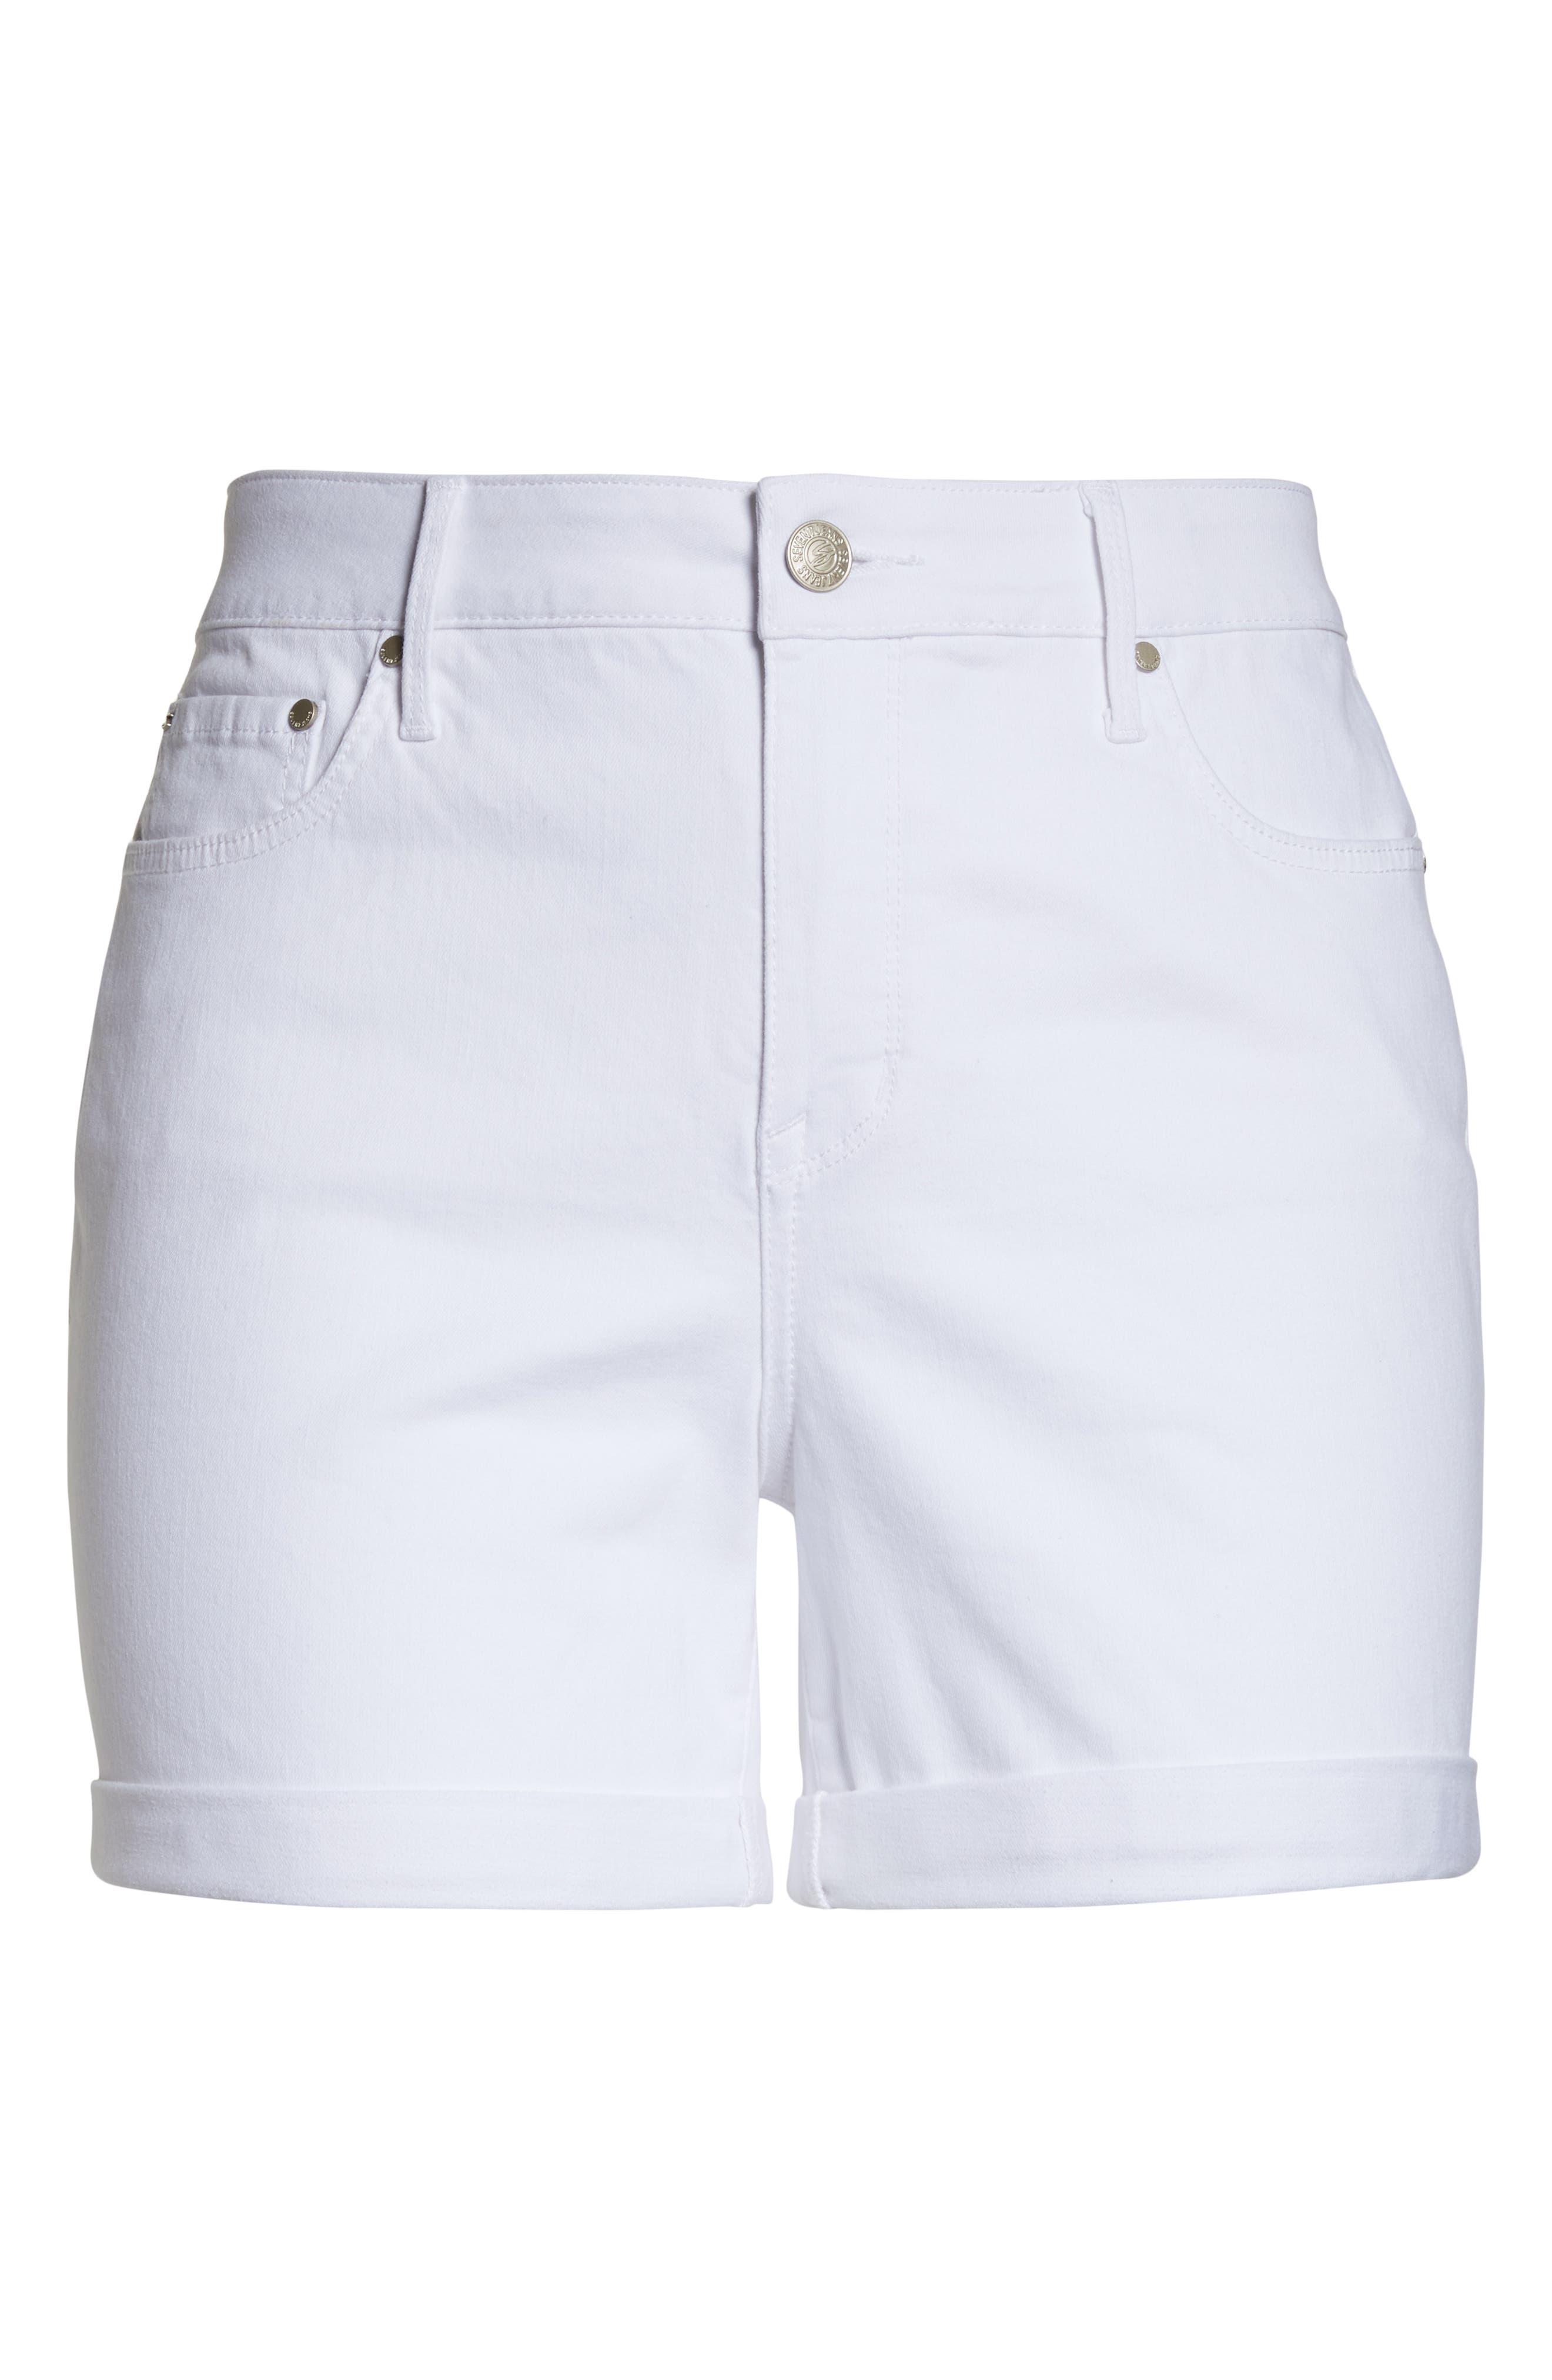 SEVEN7, High Waist Stretch Denim Shorts, Alternate thumbnail 7, color, BLANC DE BLANC